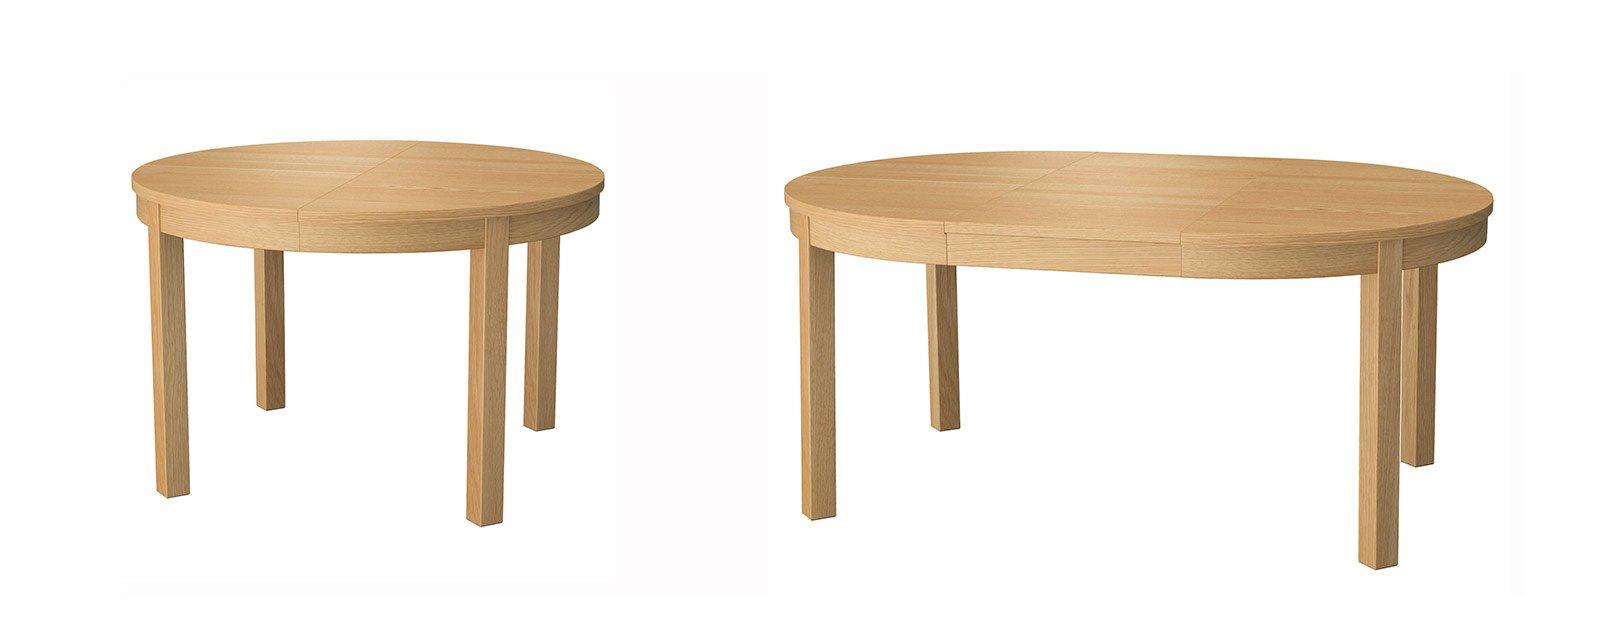 Tavoli allungabili cose di casa - Ikea tavoli da cucina allungabili ...